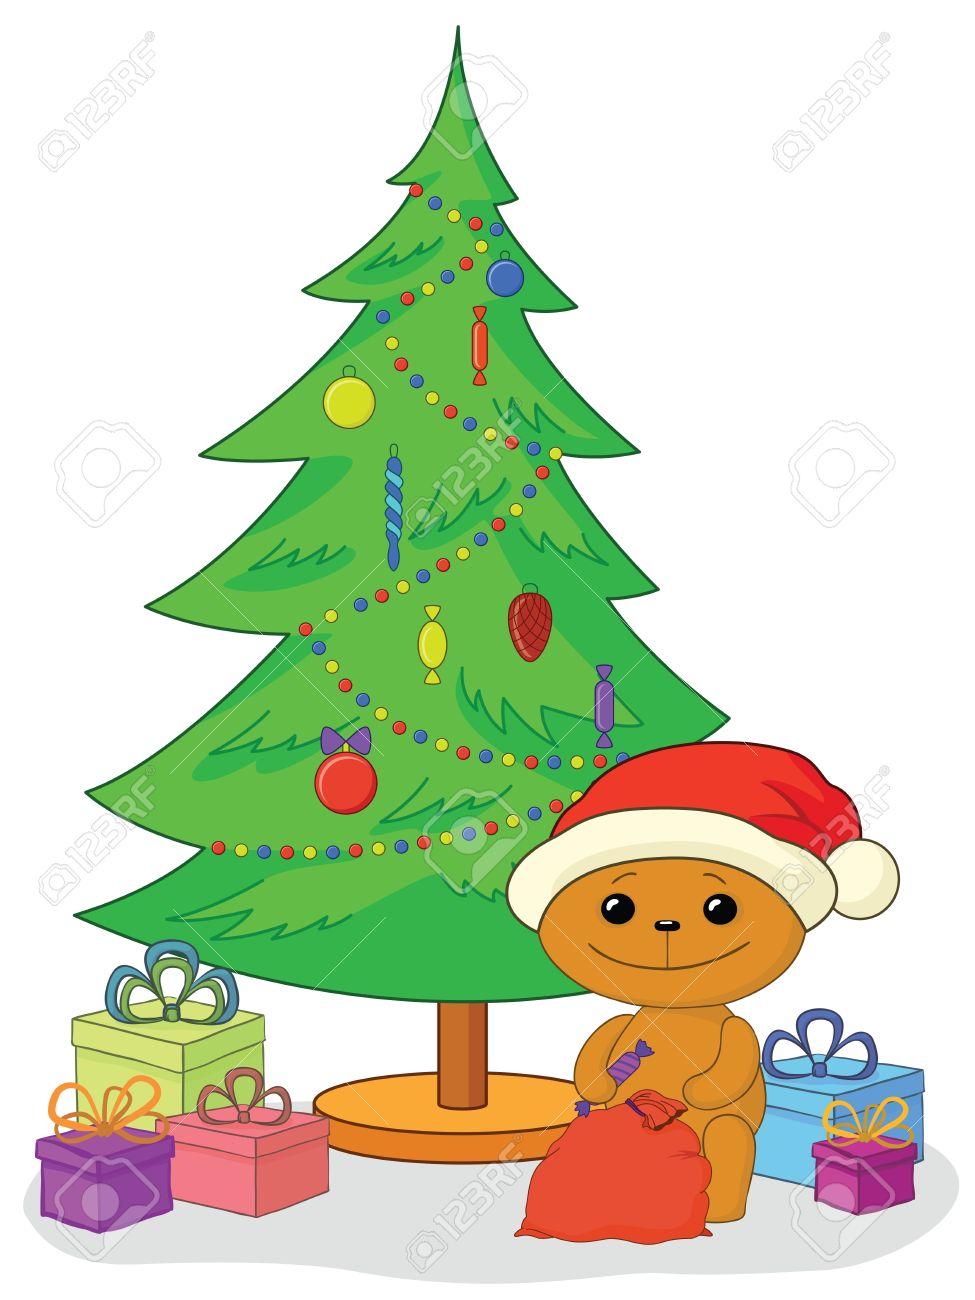 Holiday cartoon, teddy bear Santa Claus with gifts under the Christmas tree  Vector Stock Vector - 14900543